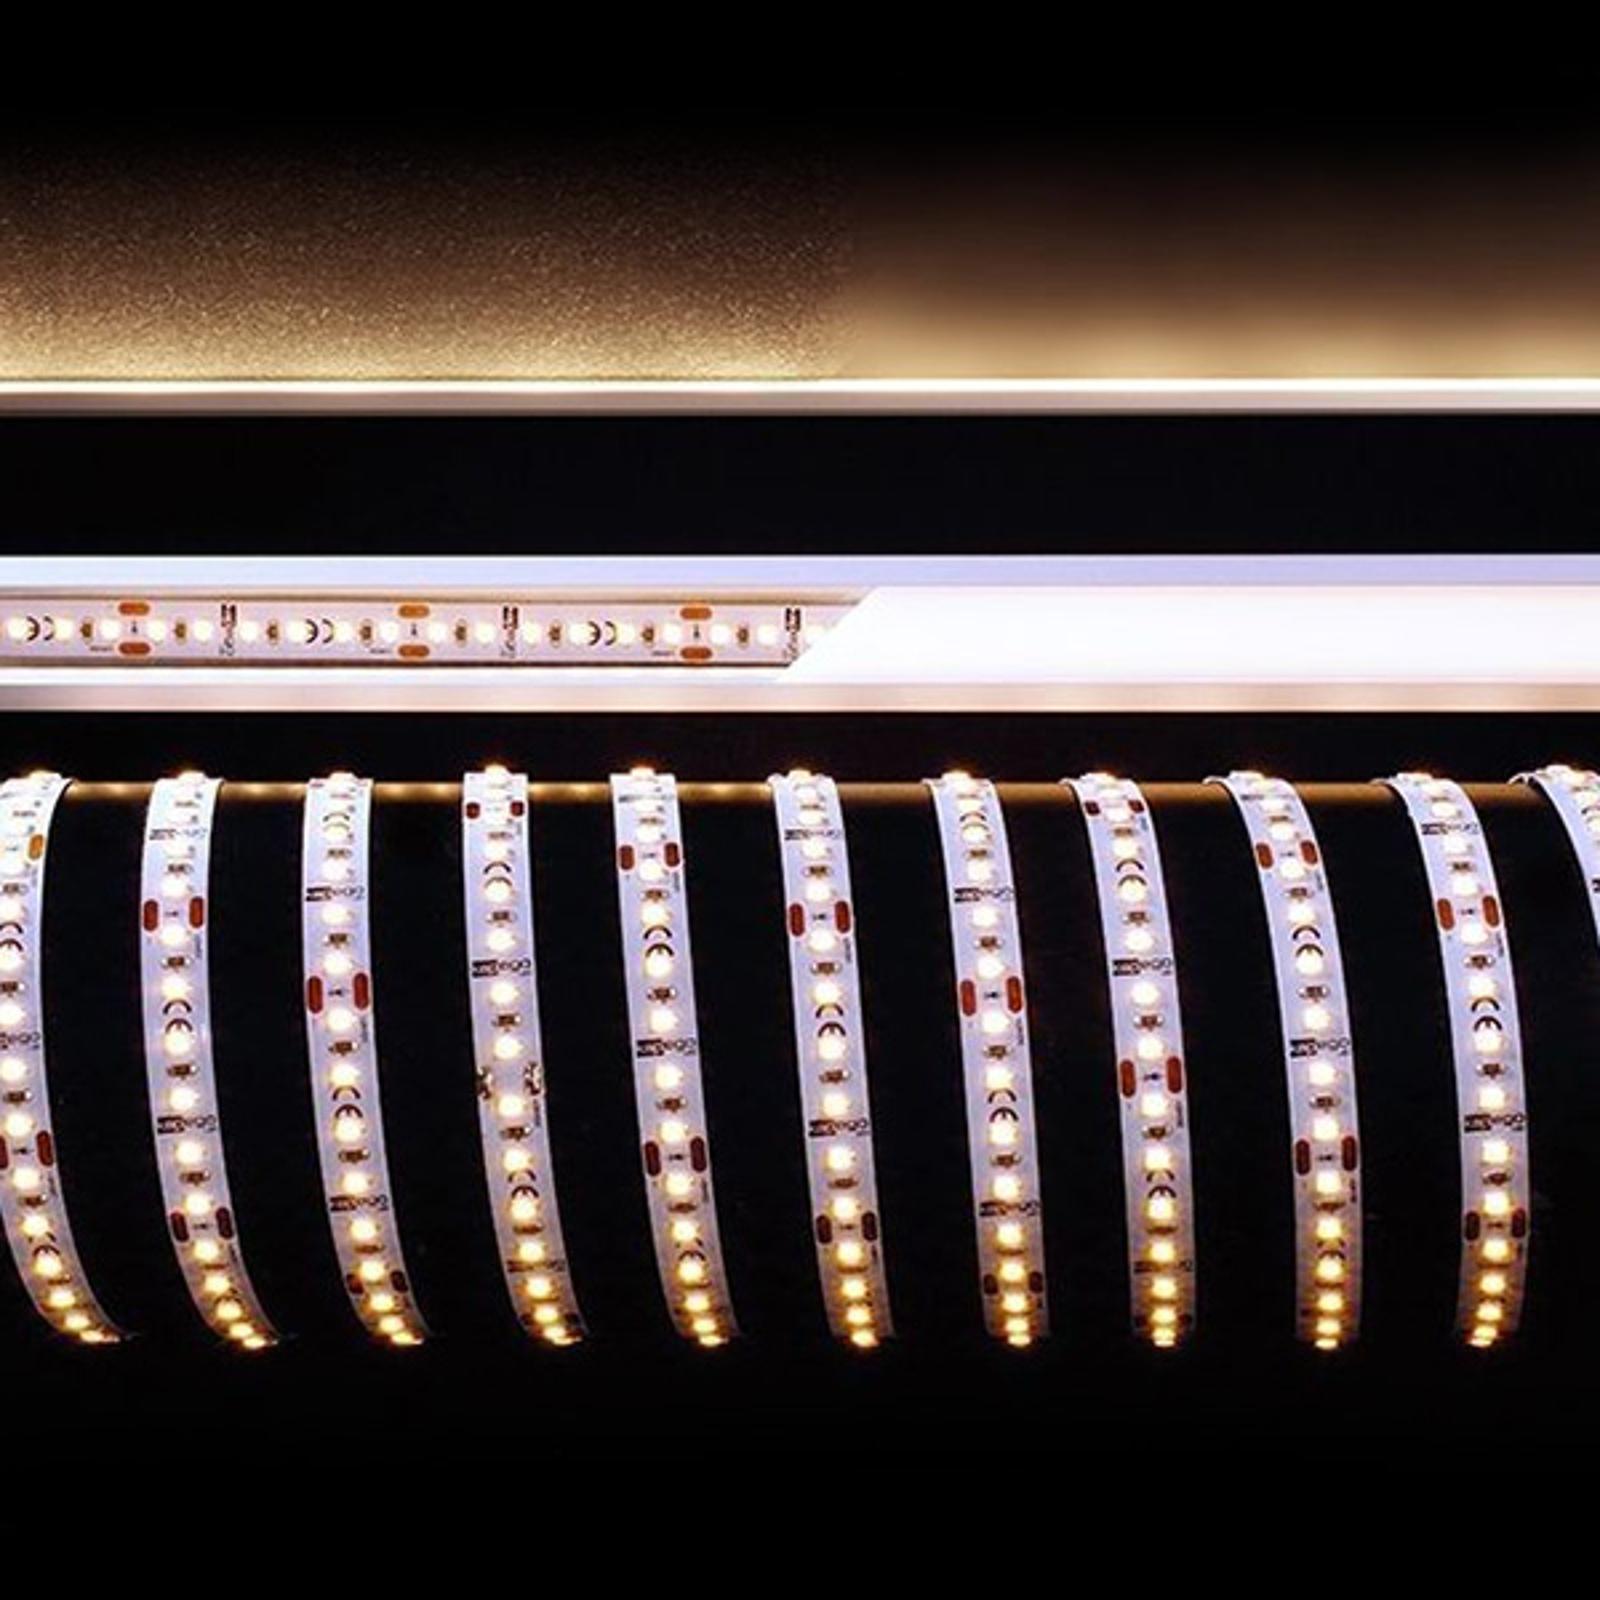 Pružný LED pásik, 100W, 500x1x0,2cm_2500305_1